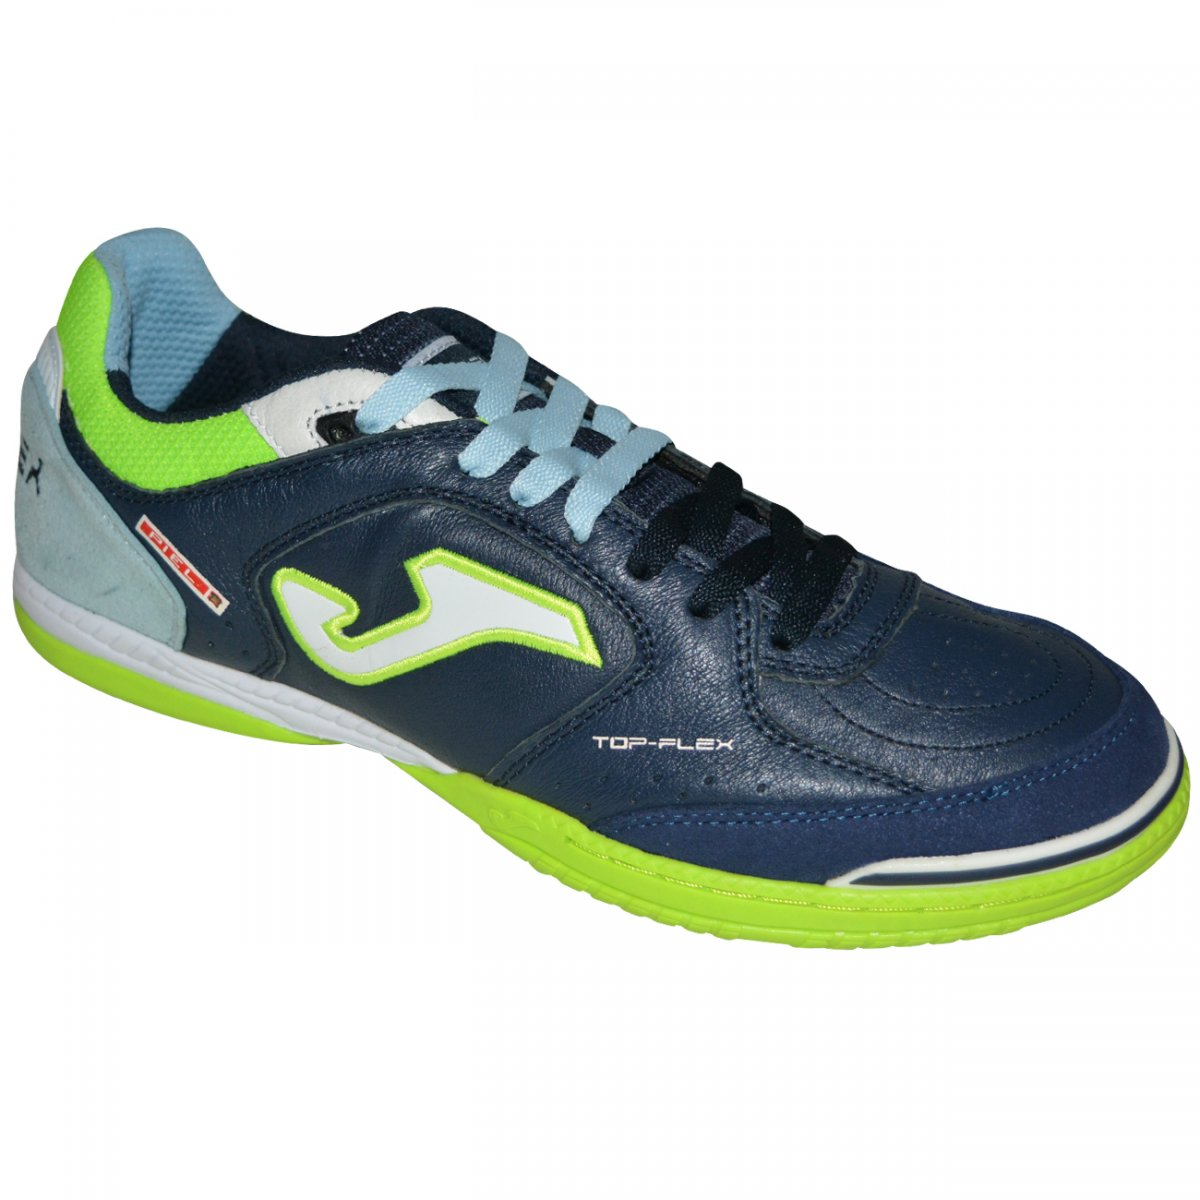 Tenis Joma Top Flex 703 TOPW.703.IN - Marinho limao branco - Chuteira Nike 7d40091a76d4c